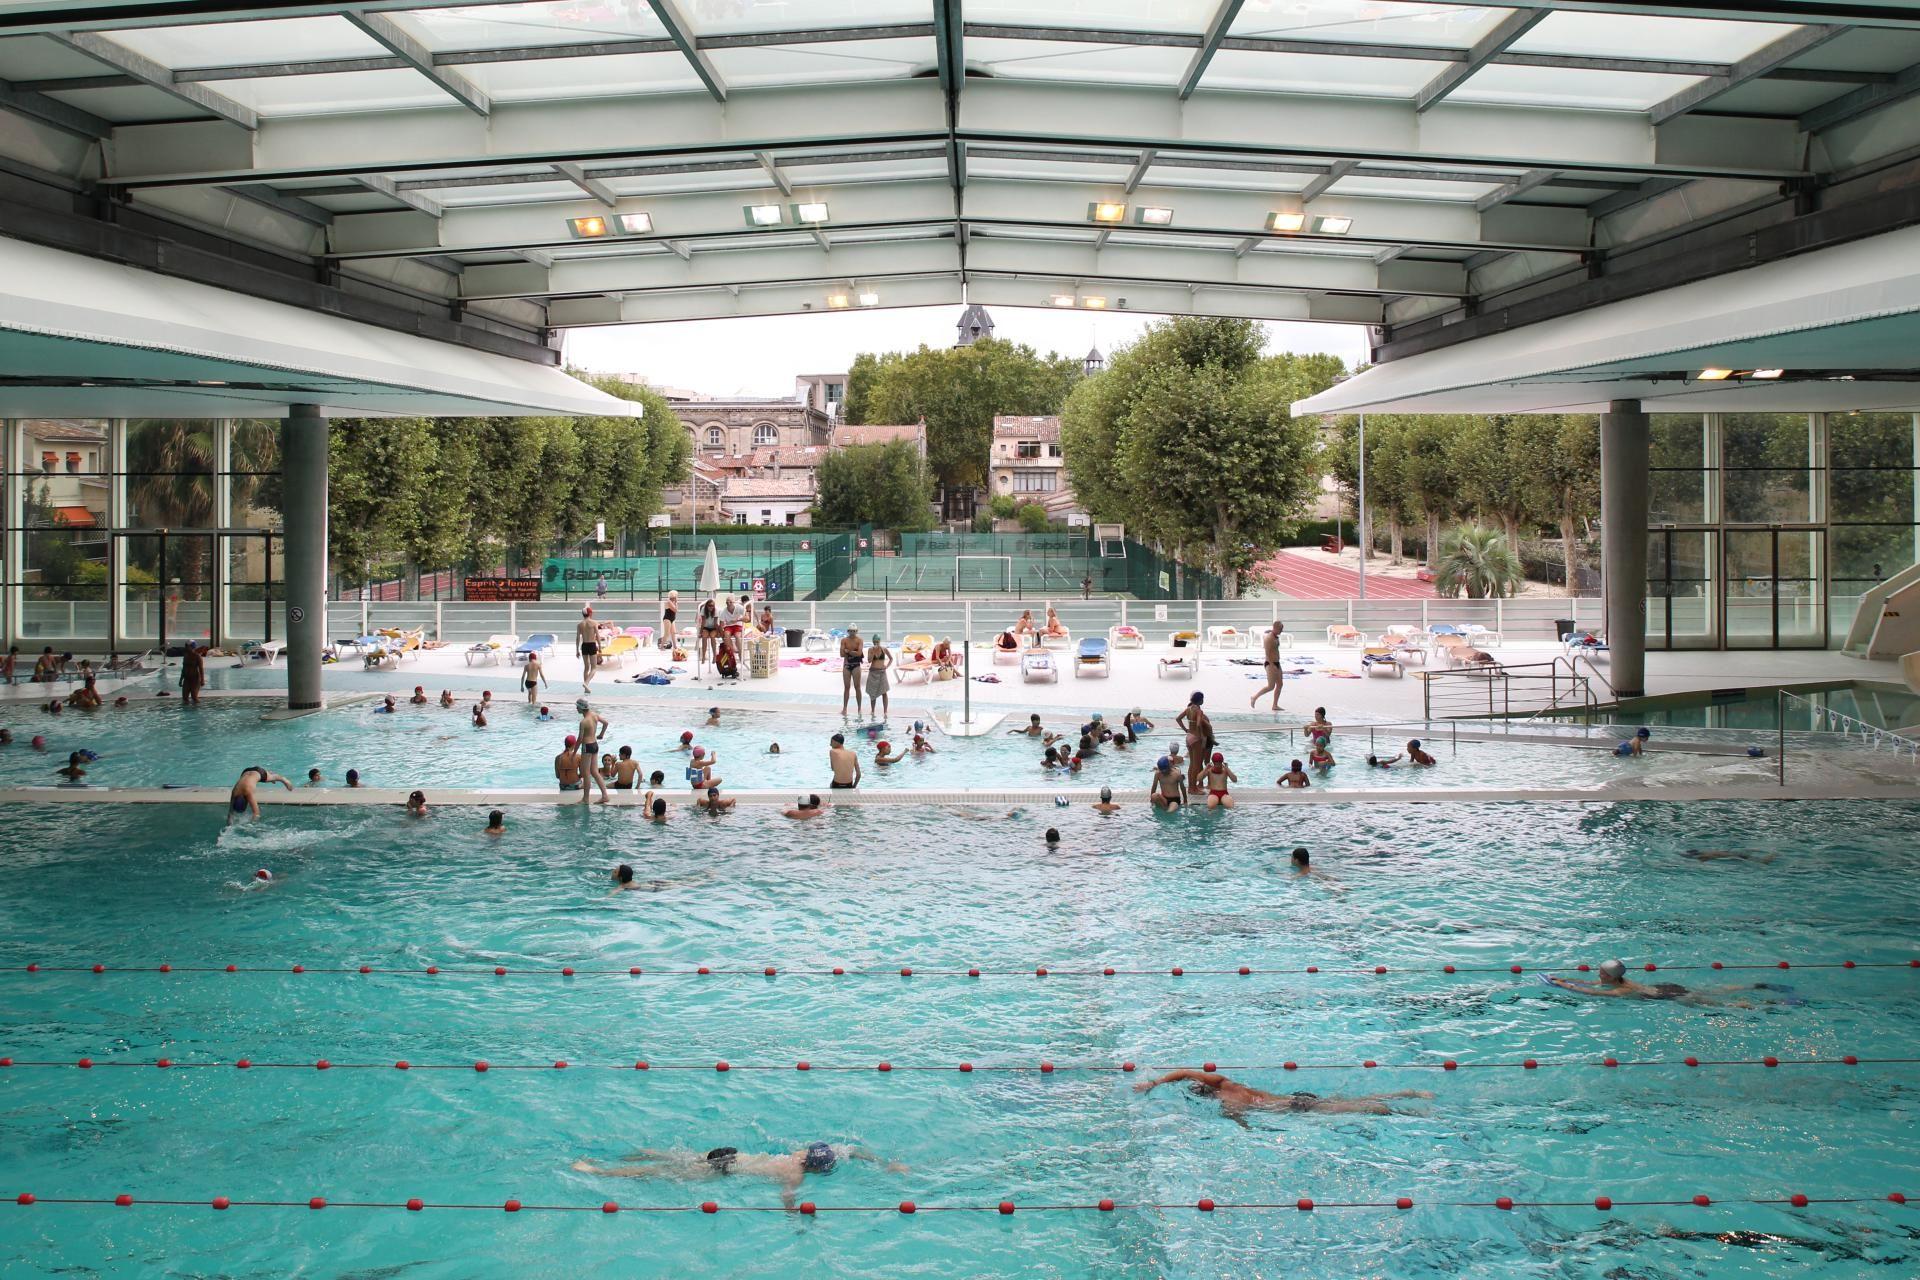 Piscine Municipale Judaïque - Jean Boiteux | Piscine ... pour Tarif Piscine Lievin